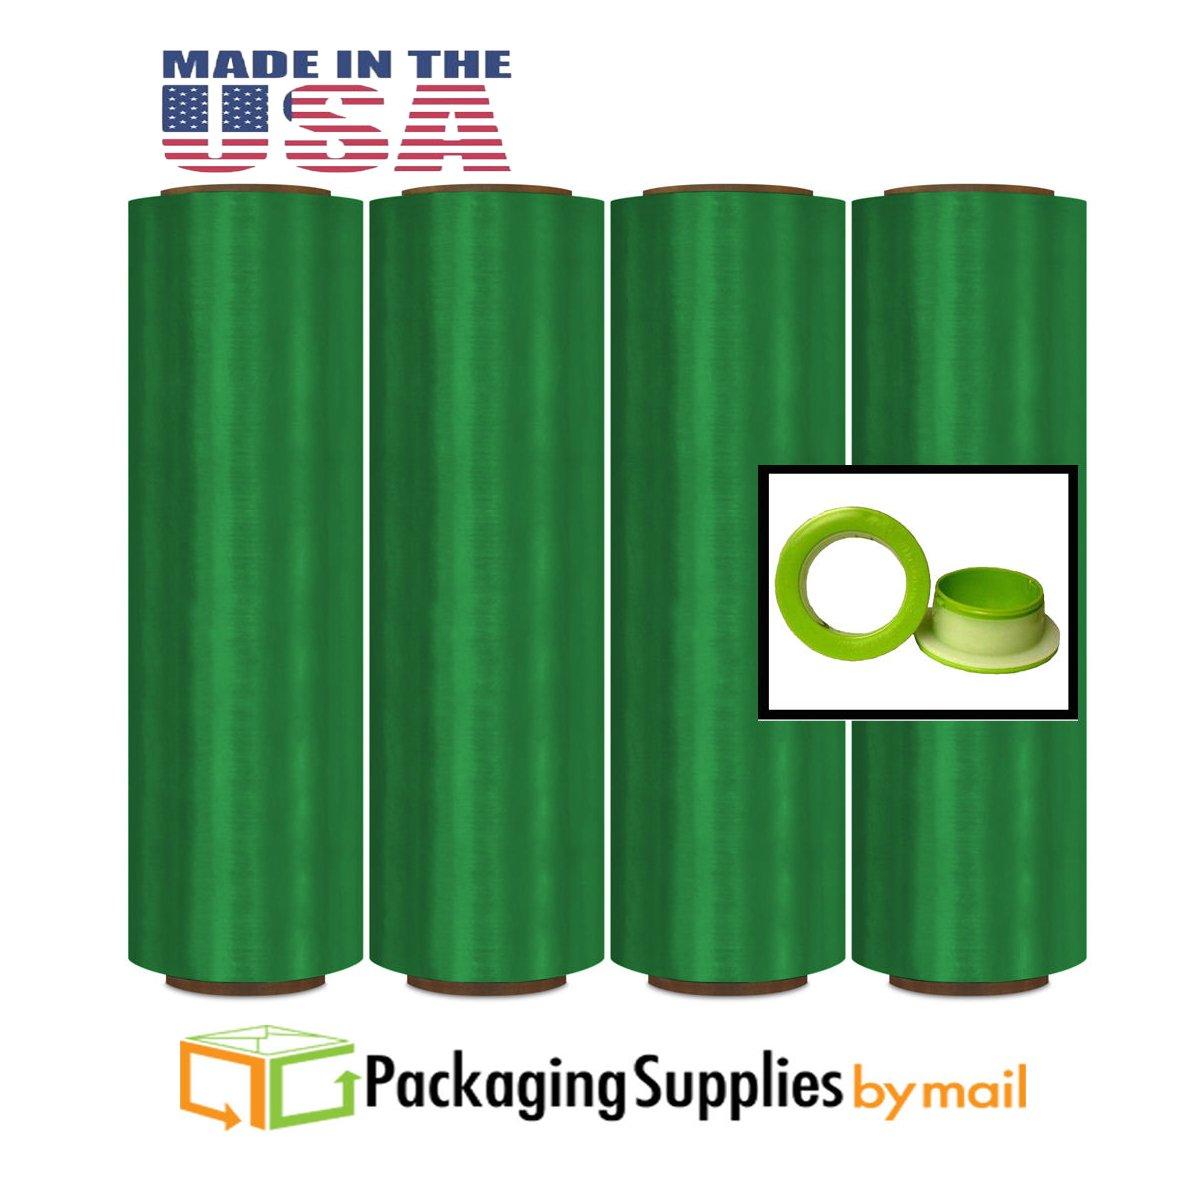 Green Color Stretch Wrap Film Advanced Pre-Stretch w/Folded Edges 17'' x 1476', 8.5 mic 4 Rolls with Dispenser